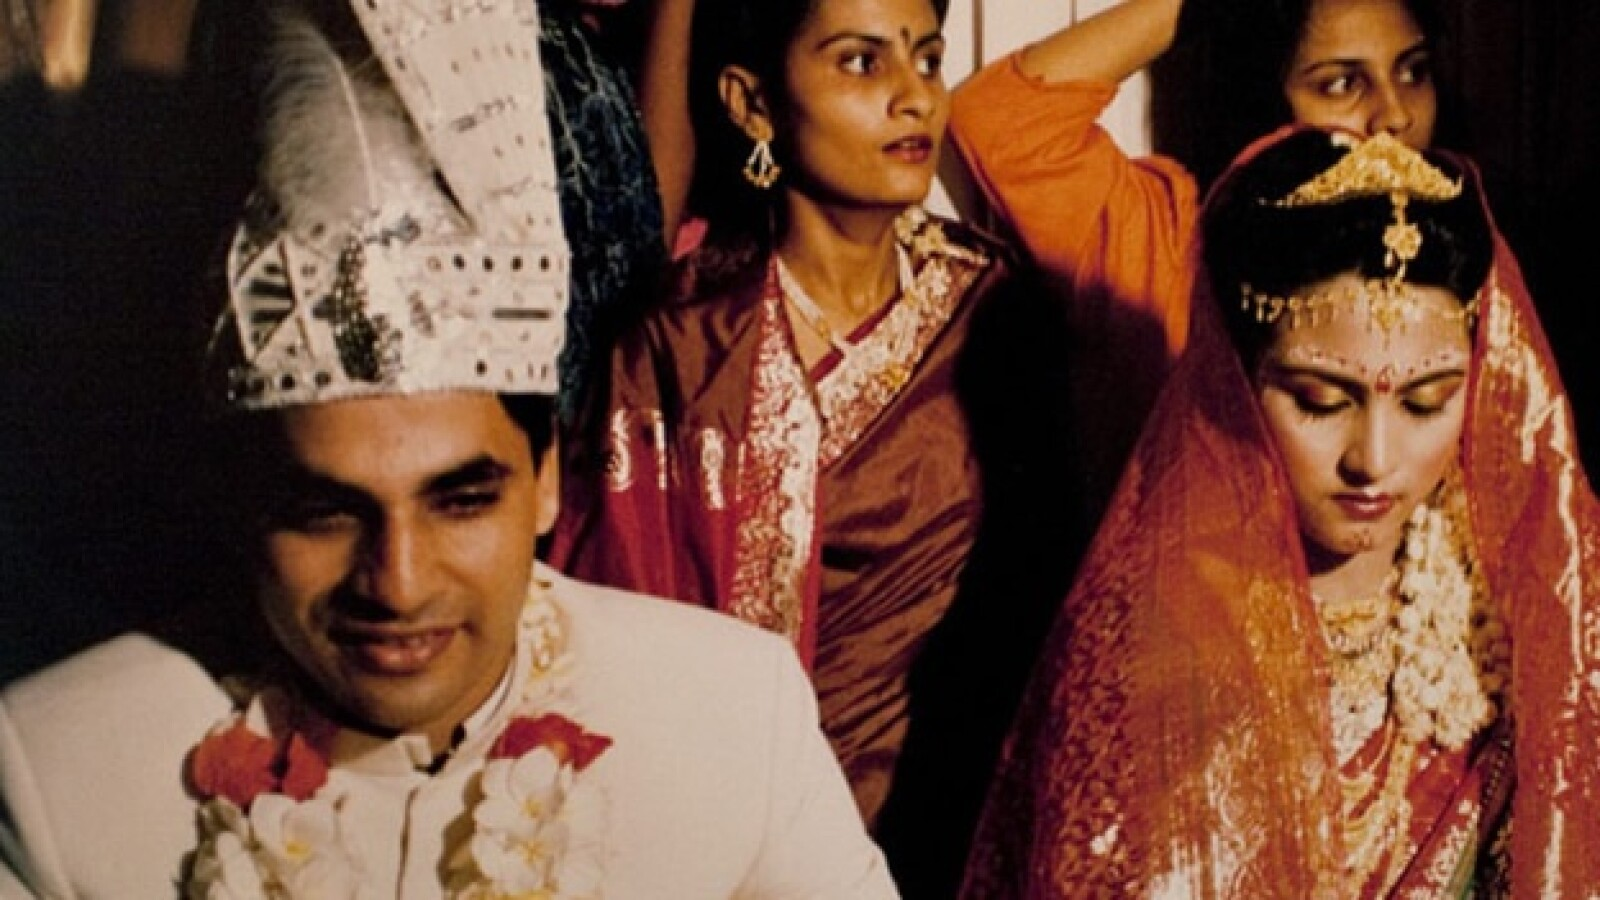 11-S - familia musulmana - boda